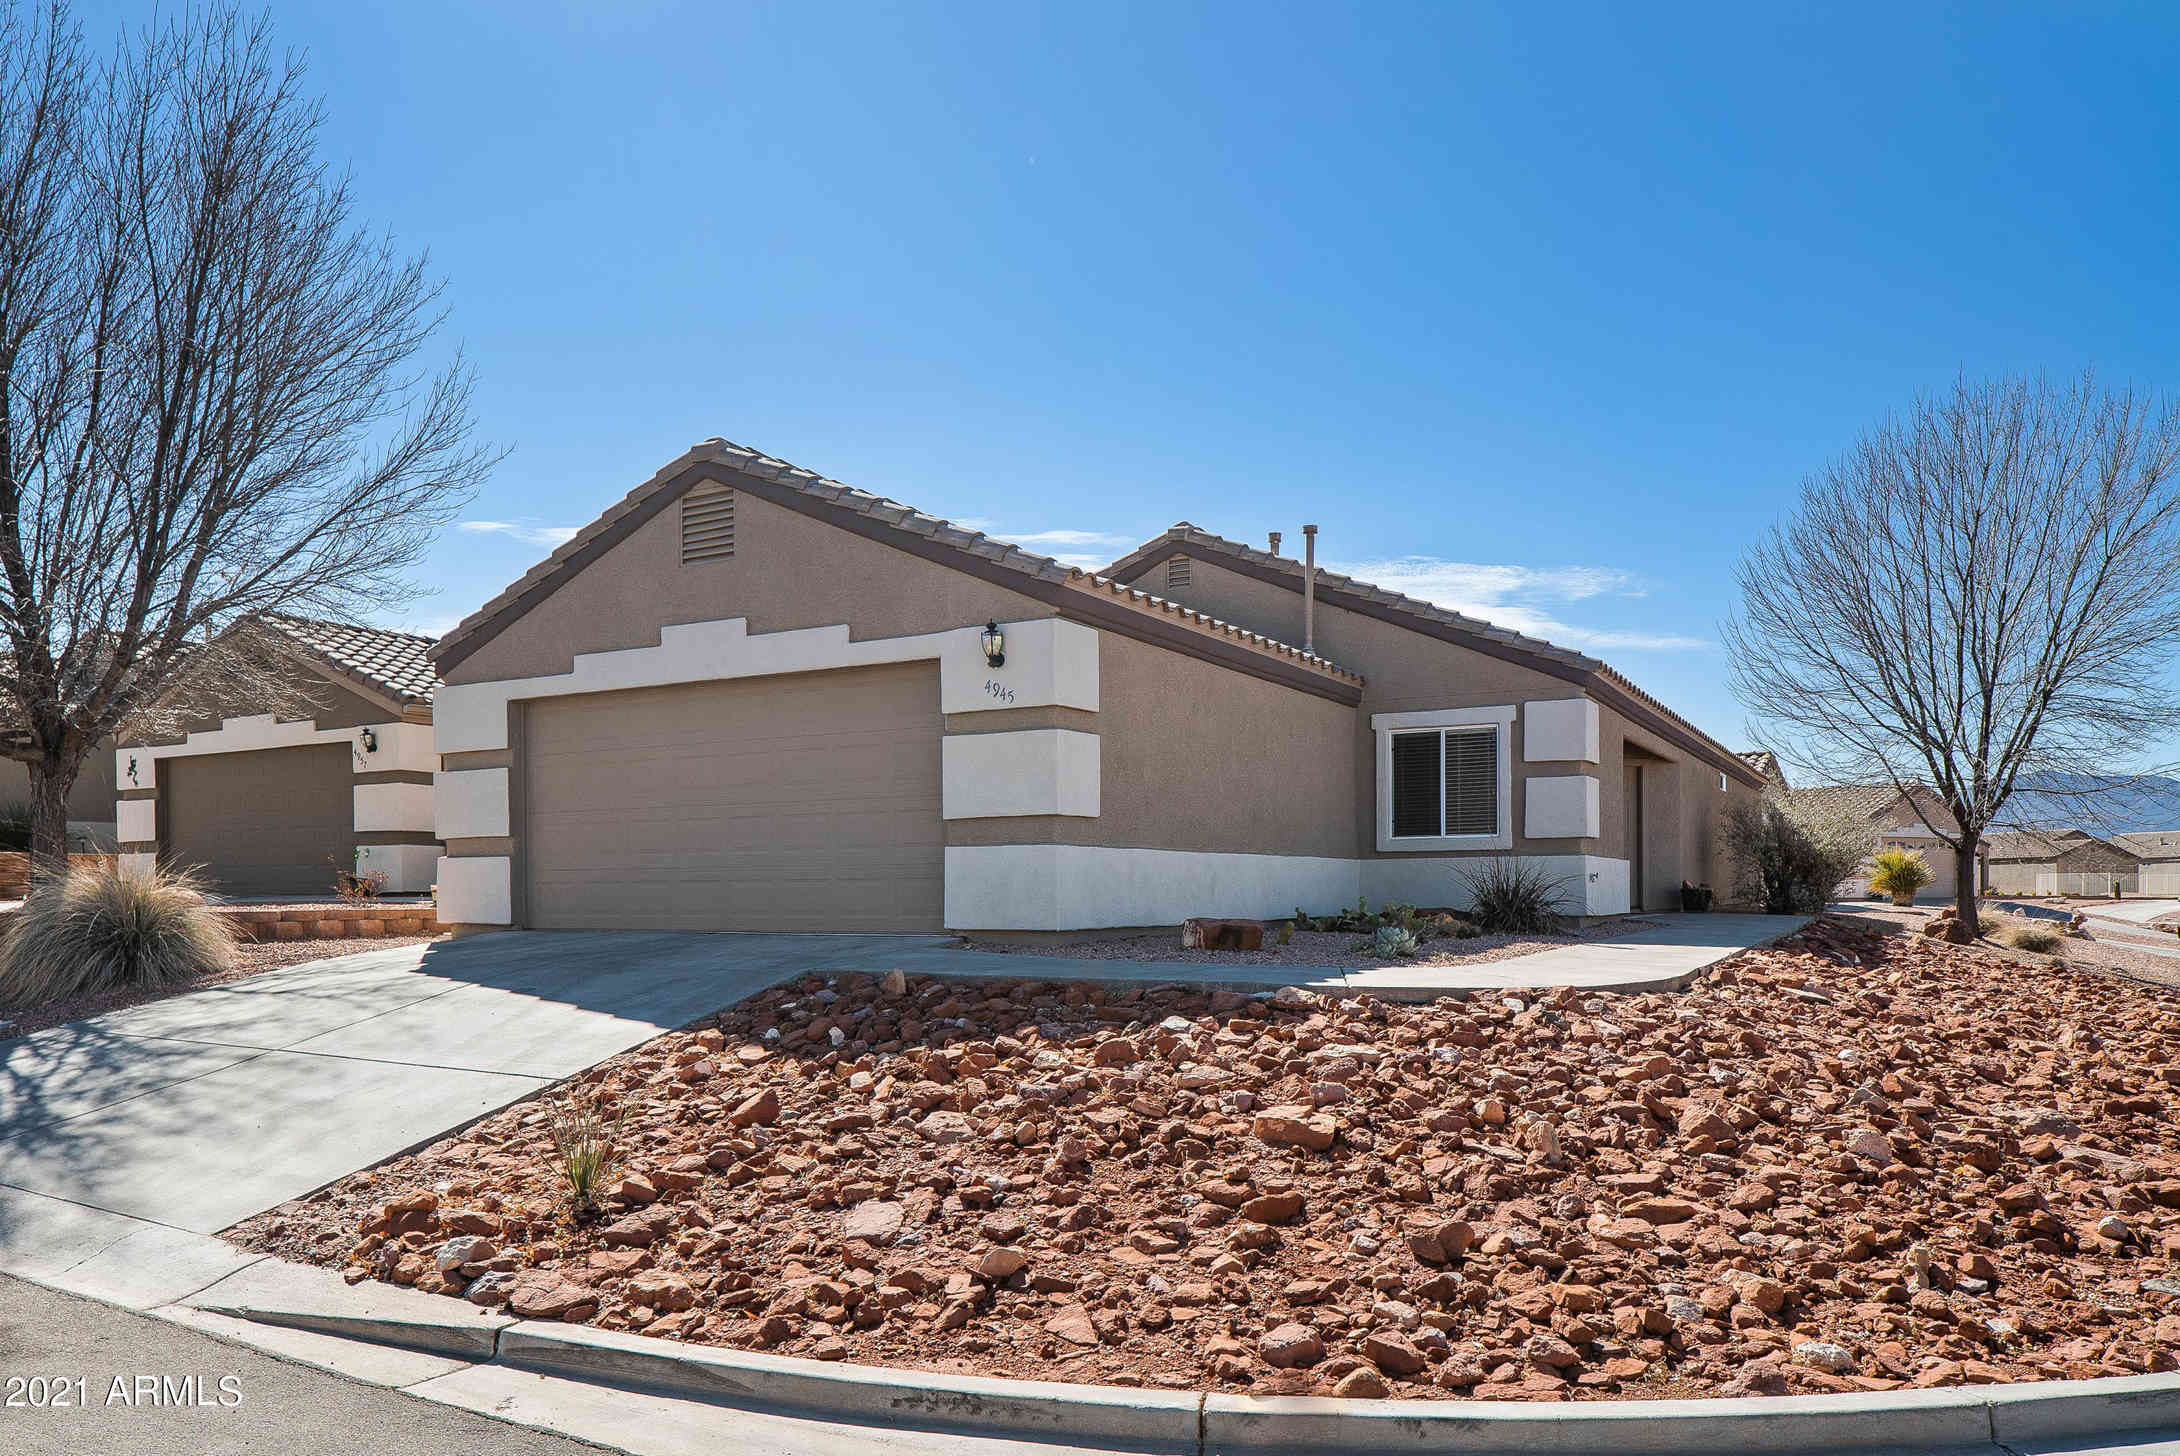 4945 E Catalina - LOT 33 --, Cornville, AZ, 86325,